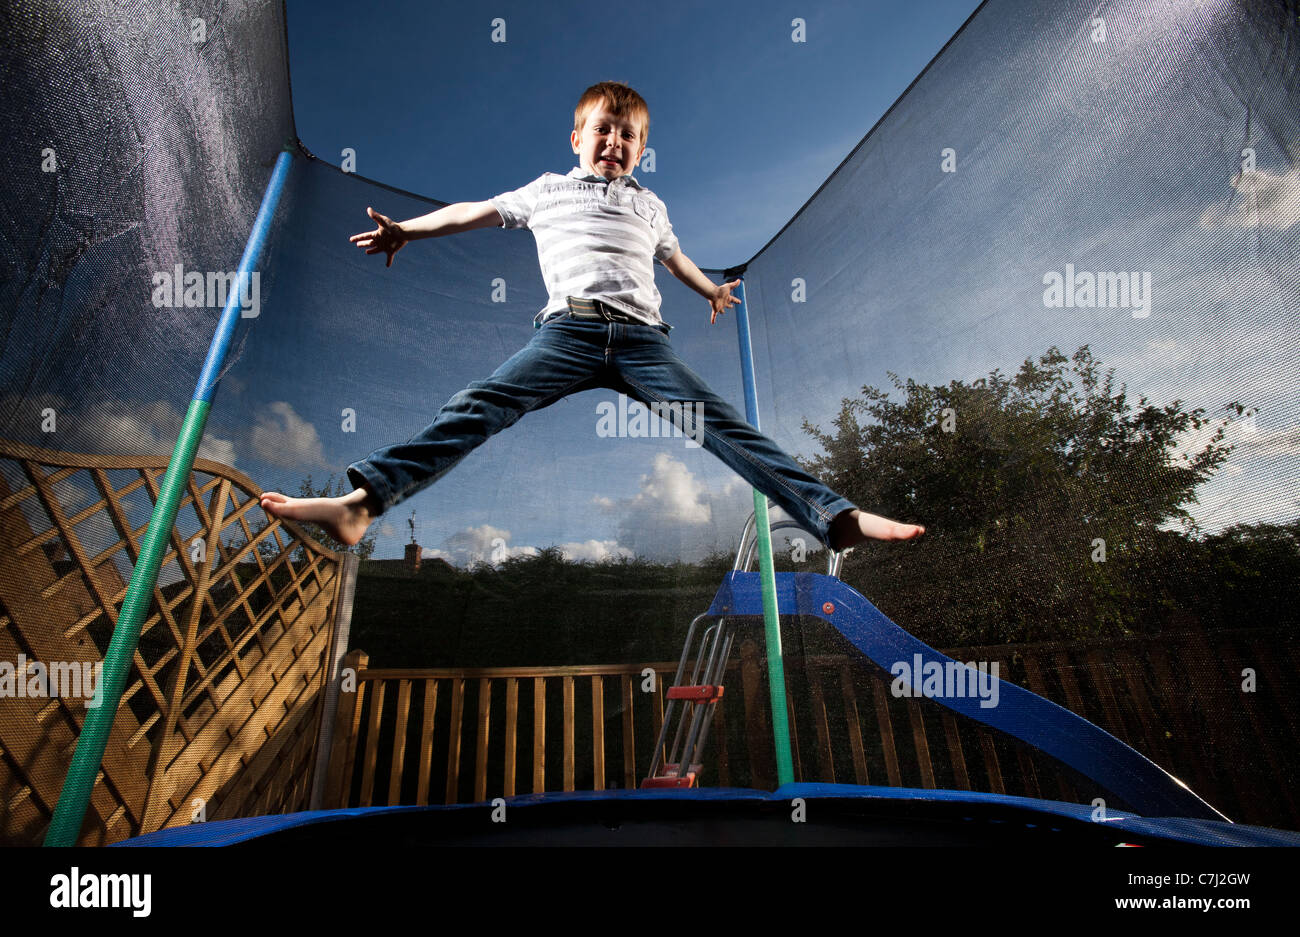 trampoline stockfotos trampoline bilder alamy. Black Bedroom Furniture Sets. Home Design Ideas